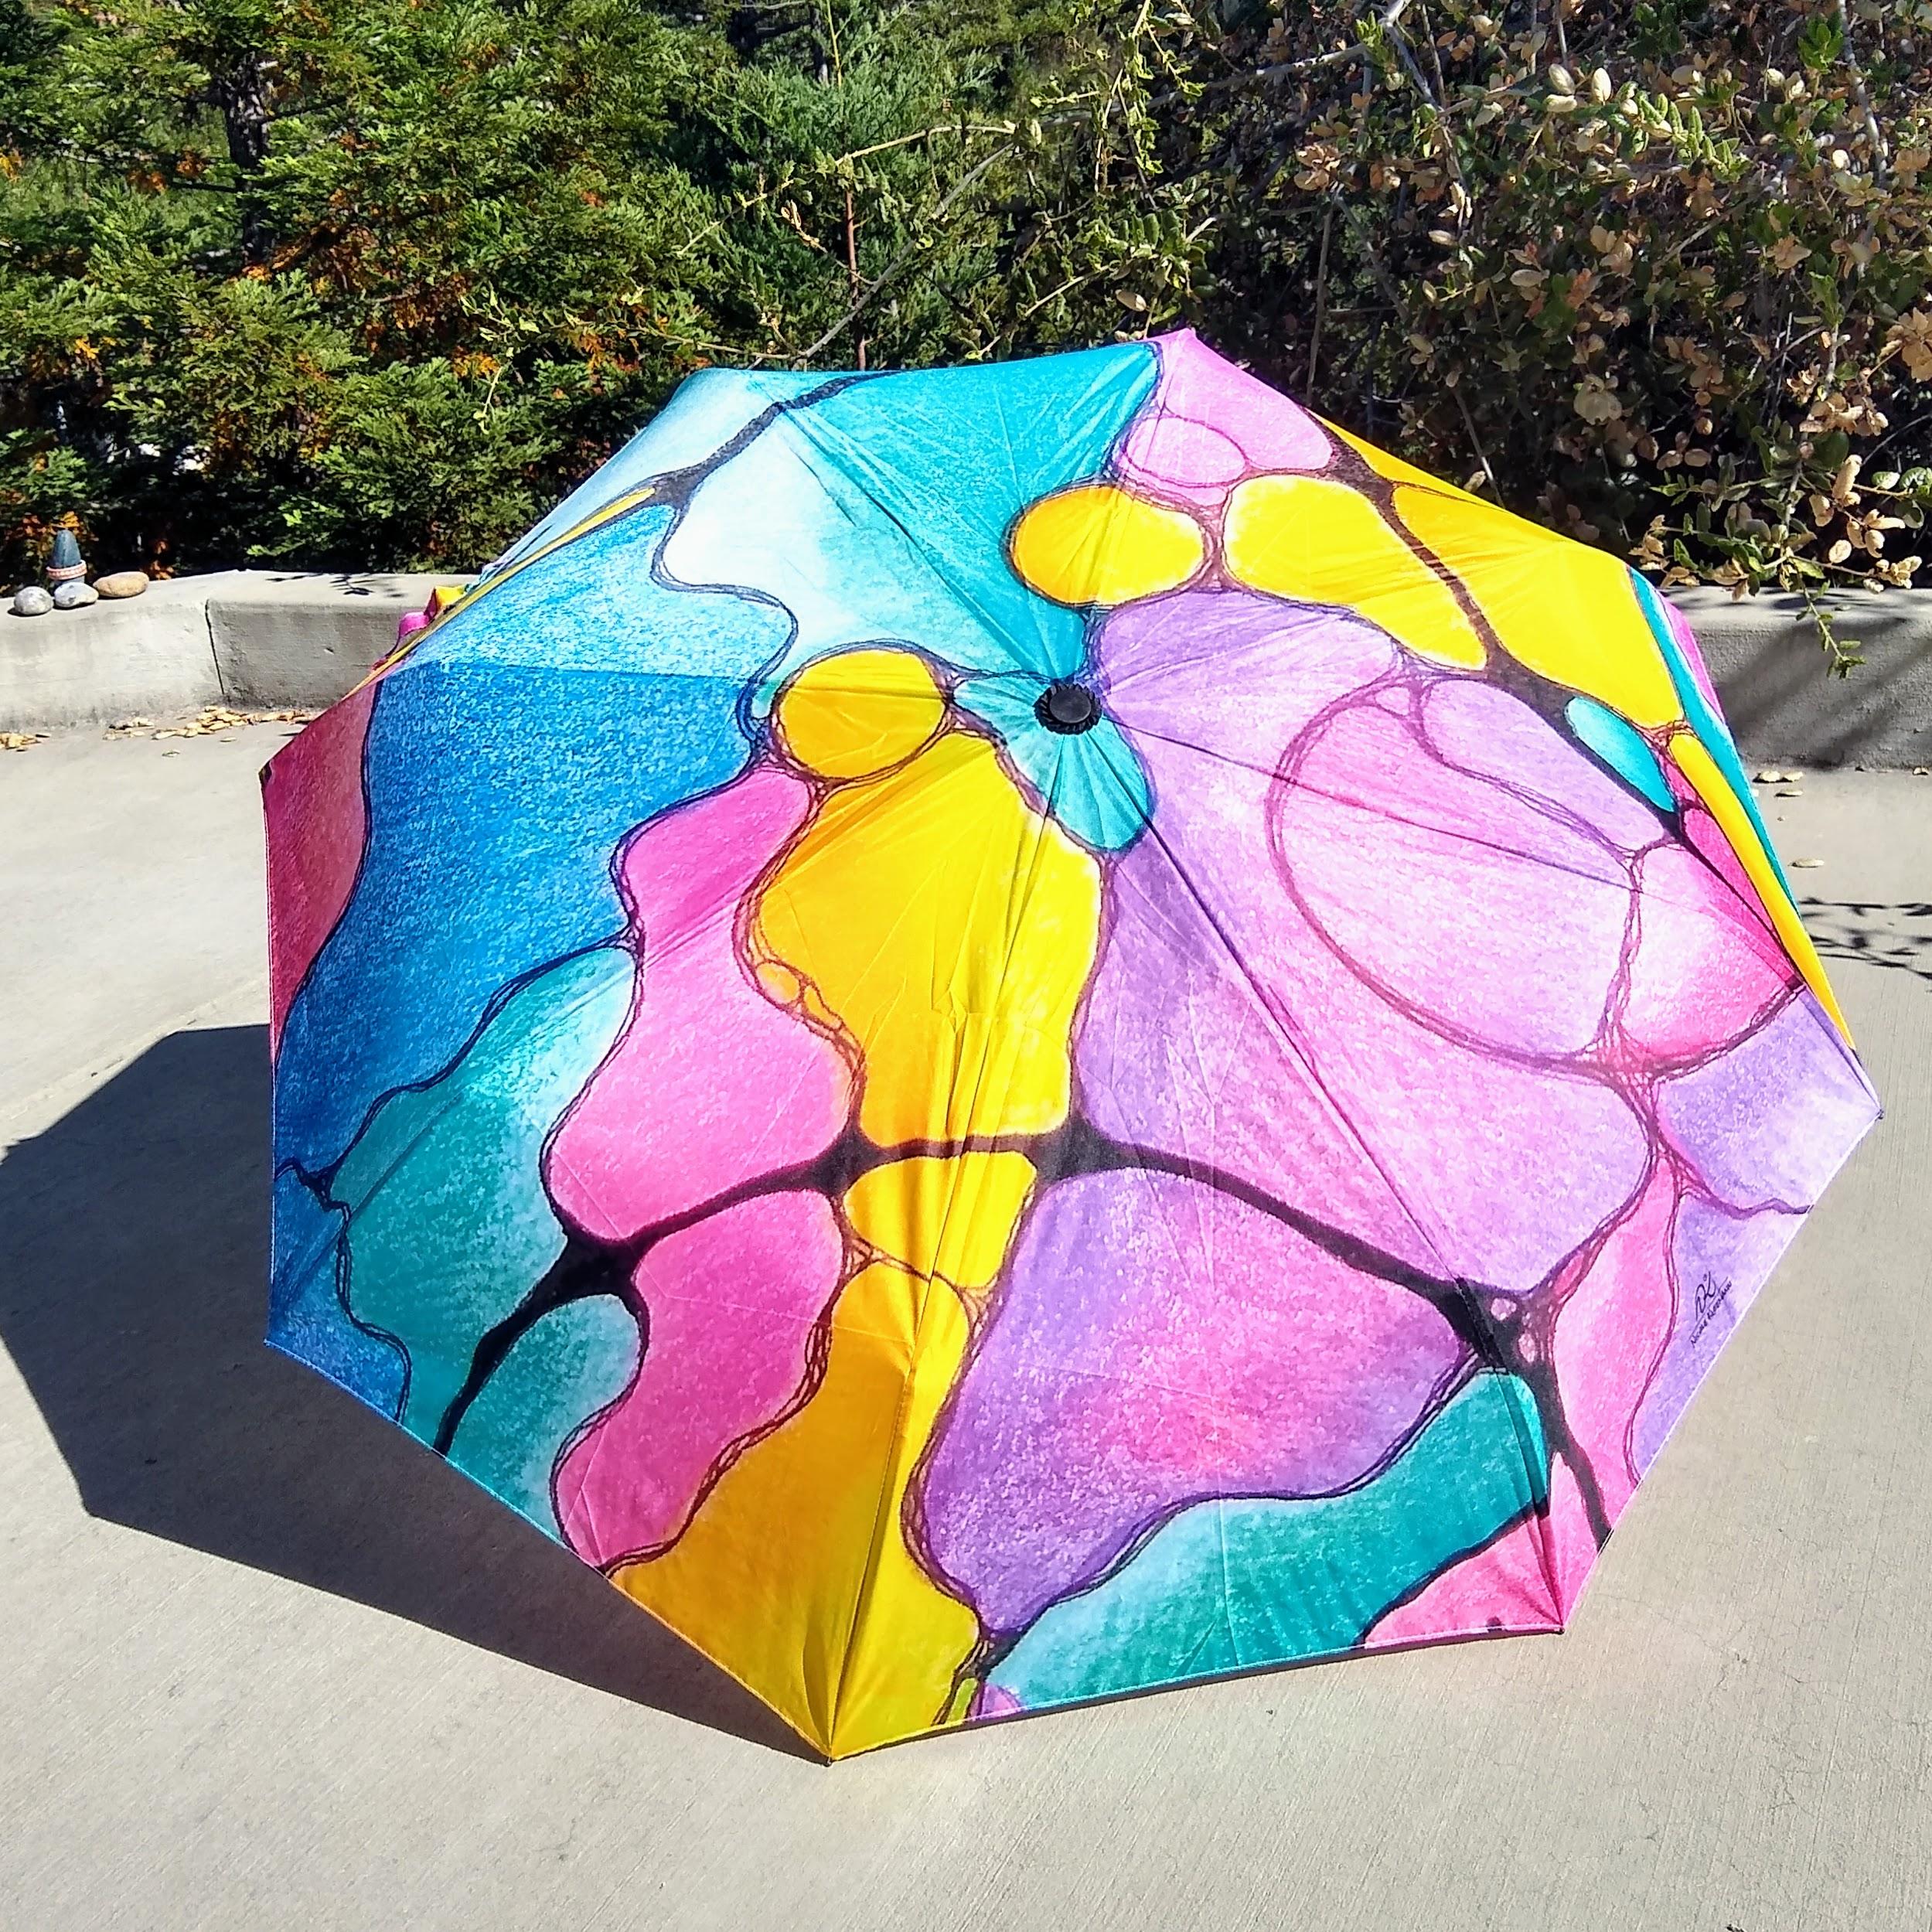 UmbrellaMyInnerWorld.jpg